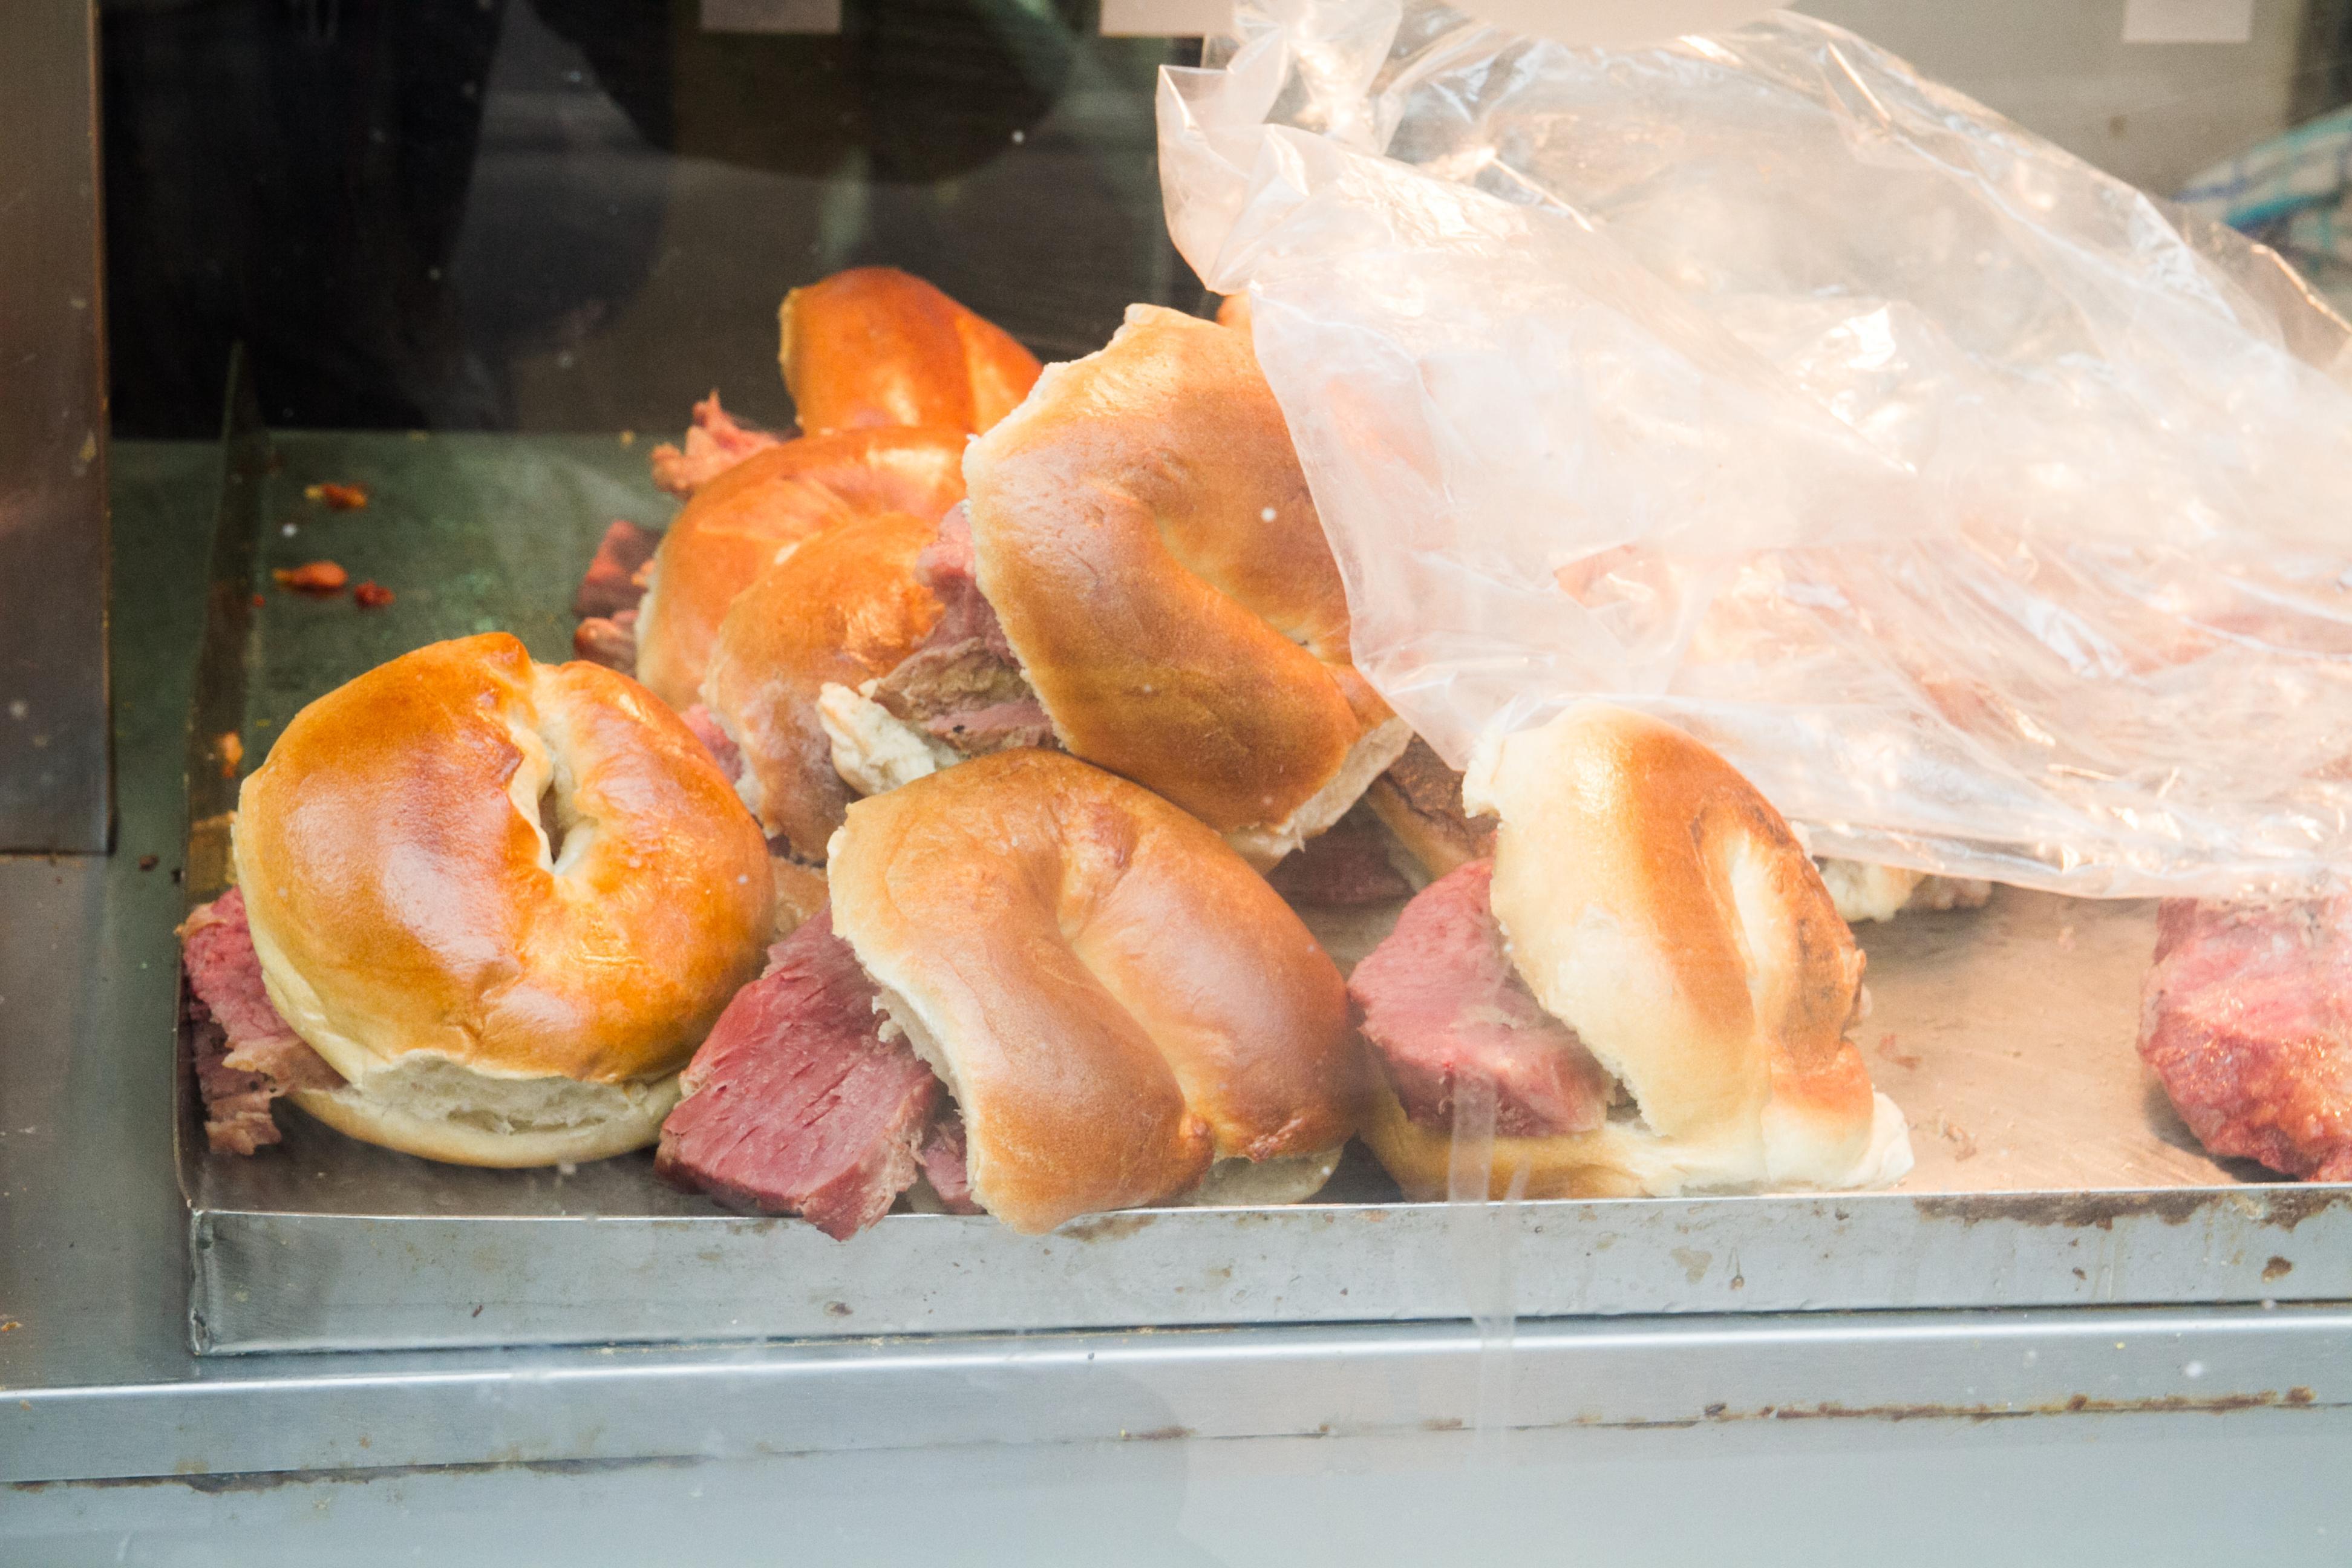 London's best bagels include salt beef at Beigel Bake